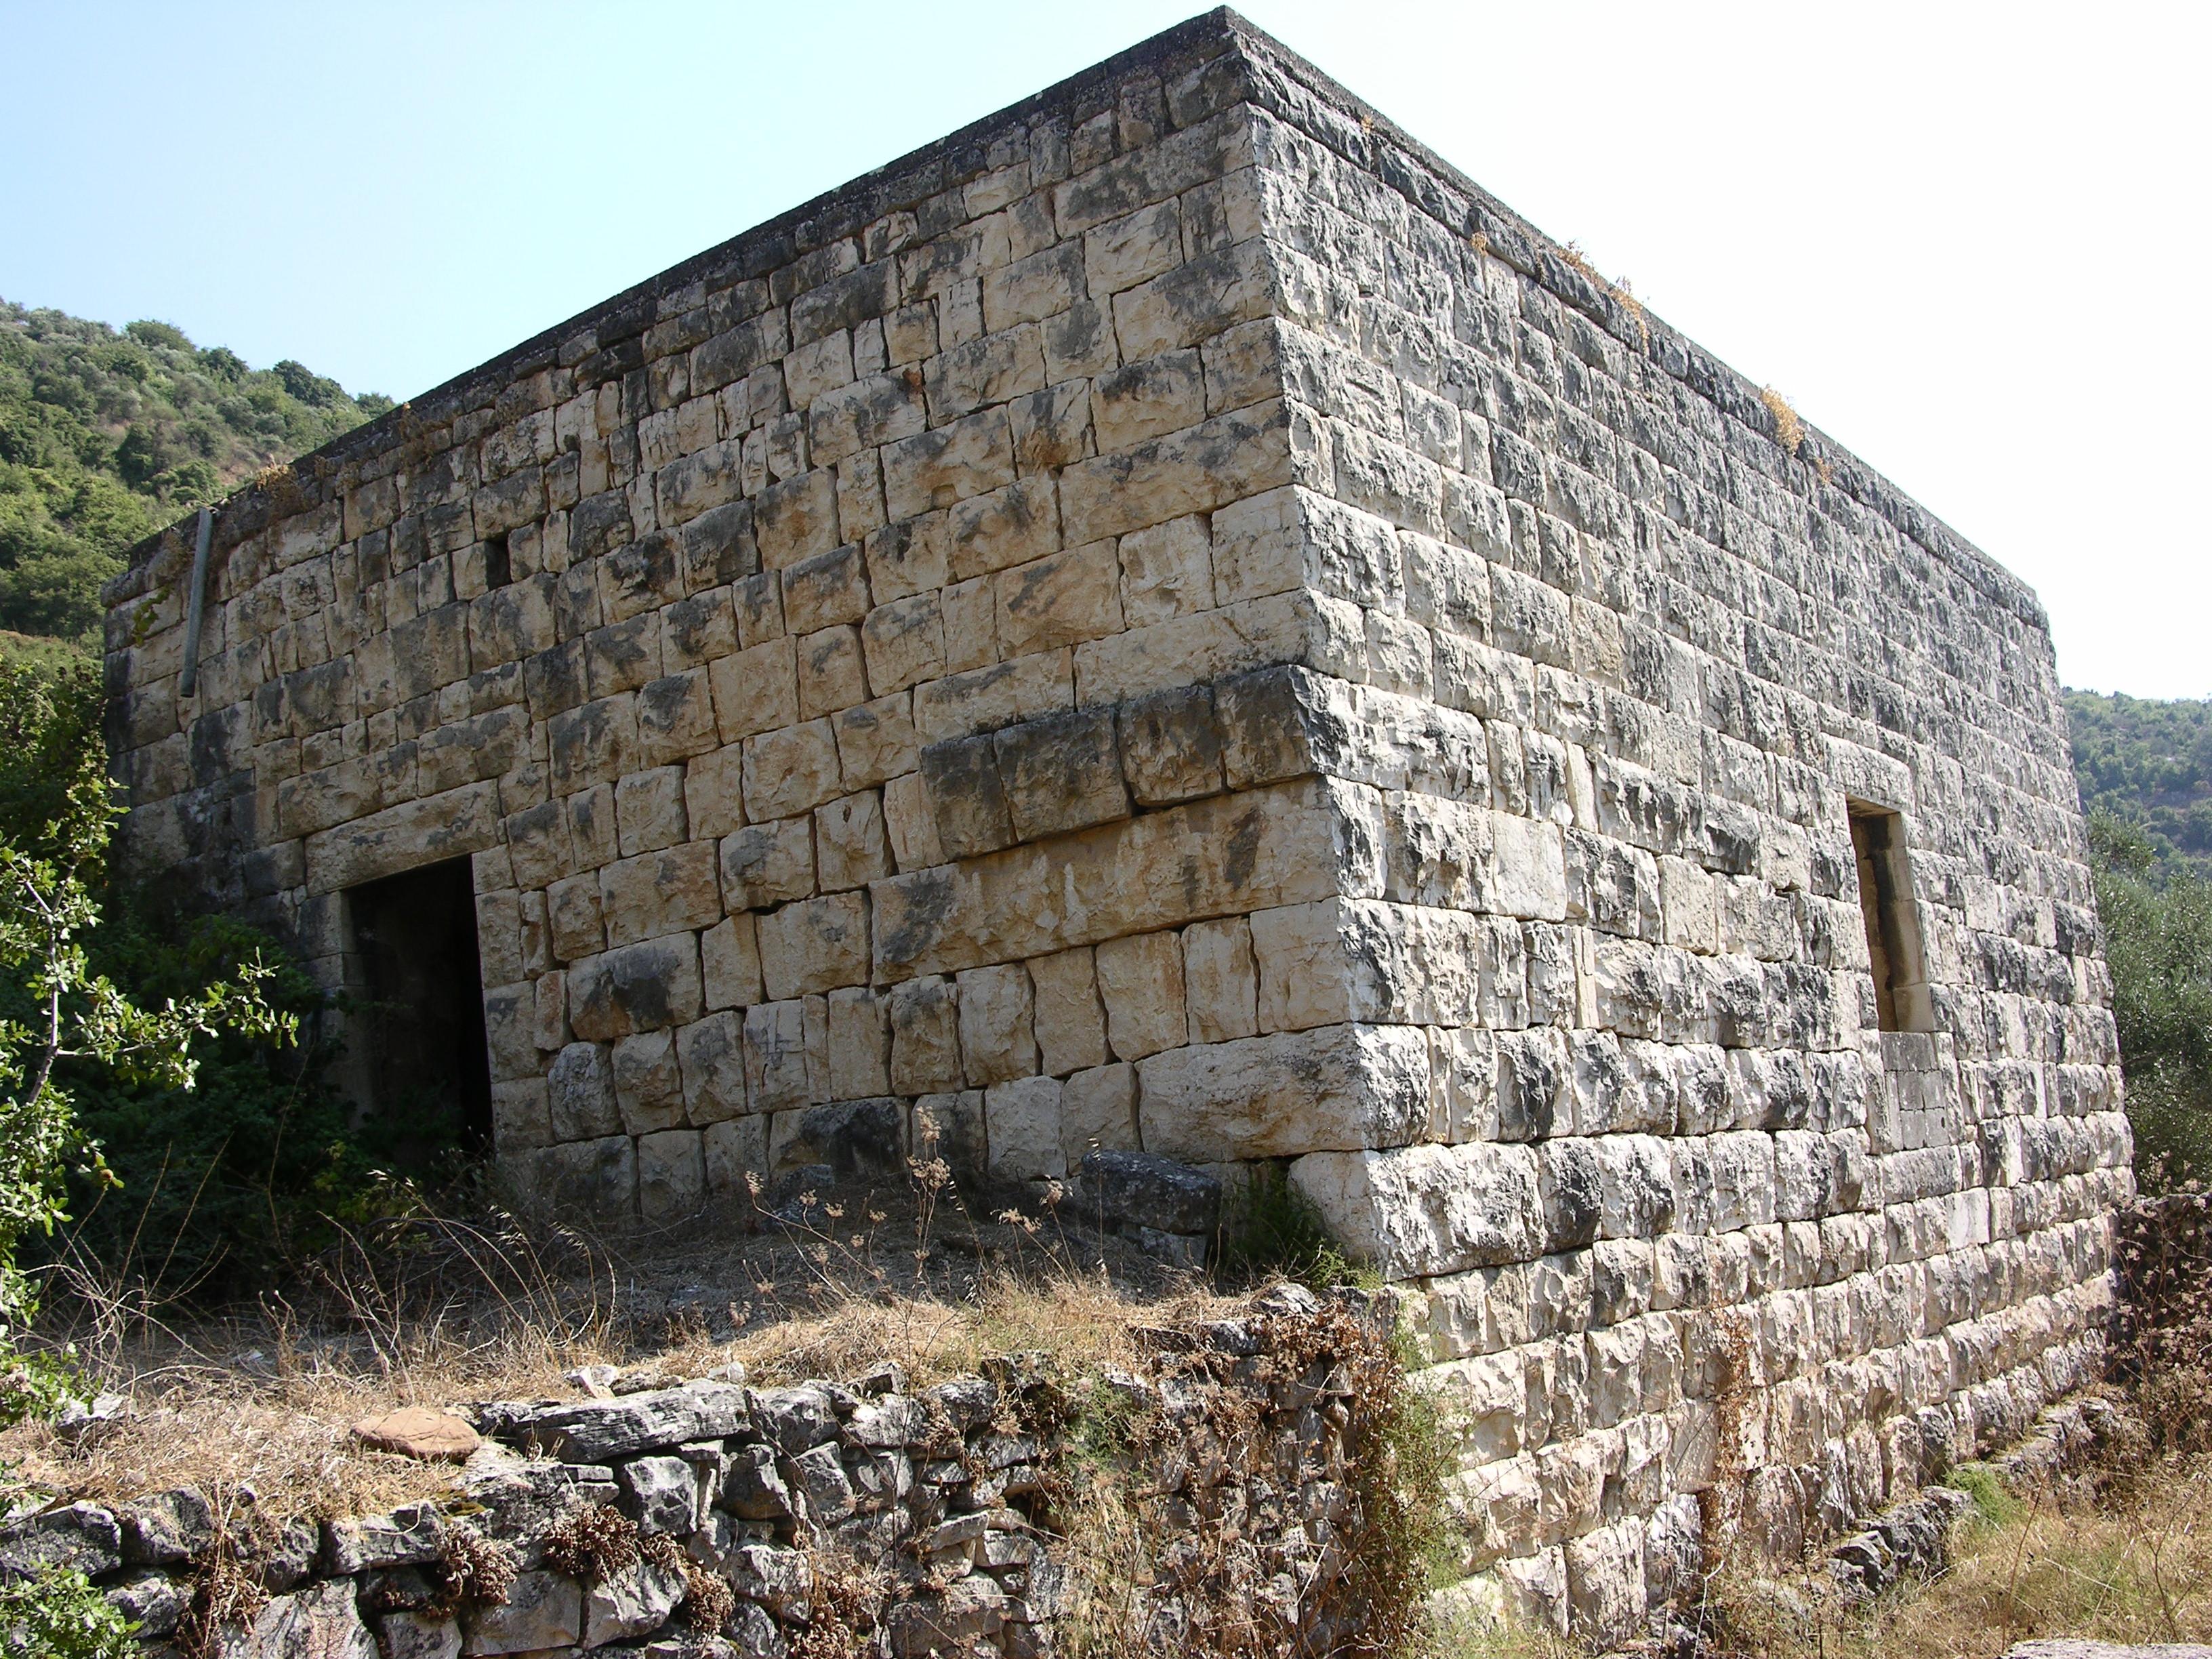 Fig. 12: Ottoman village, House 1 (Waliszewski and Chmielewski 2009–2010)